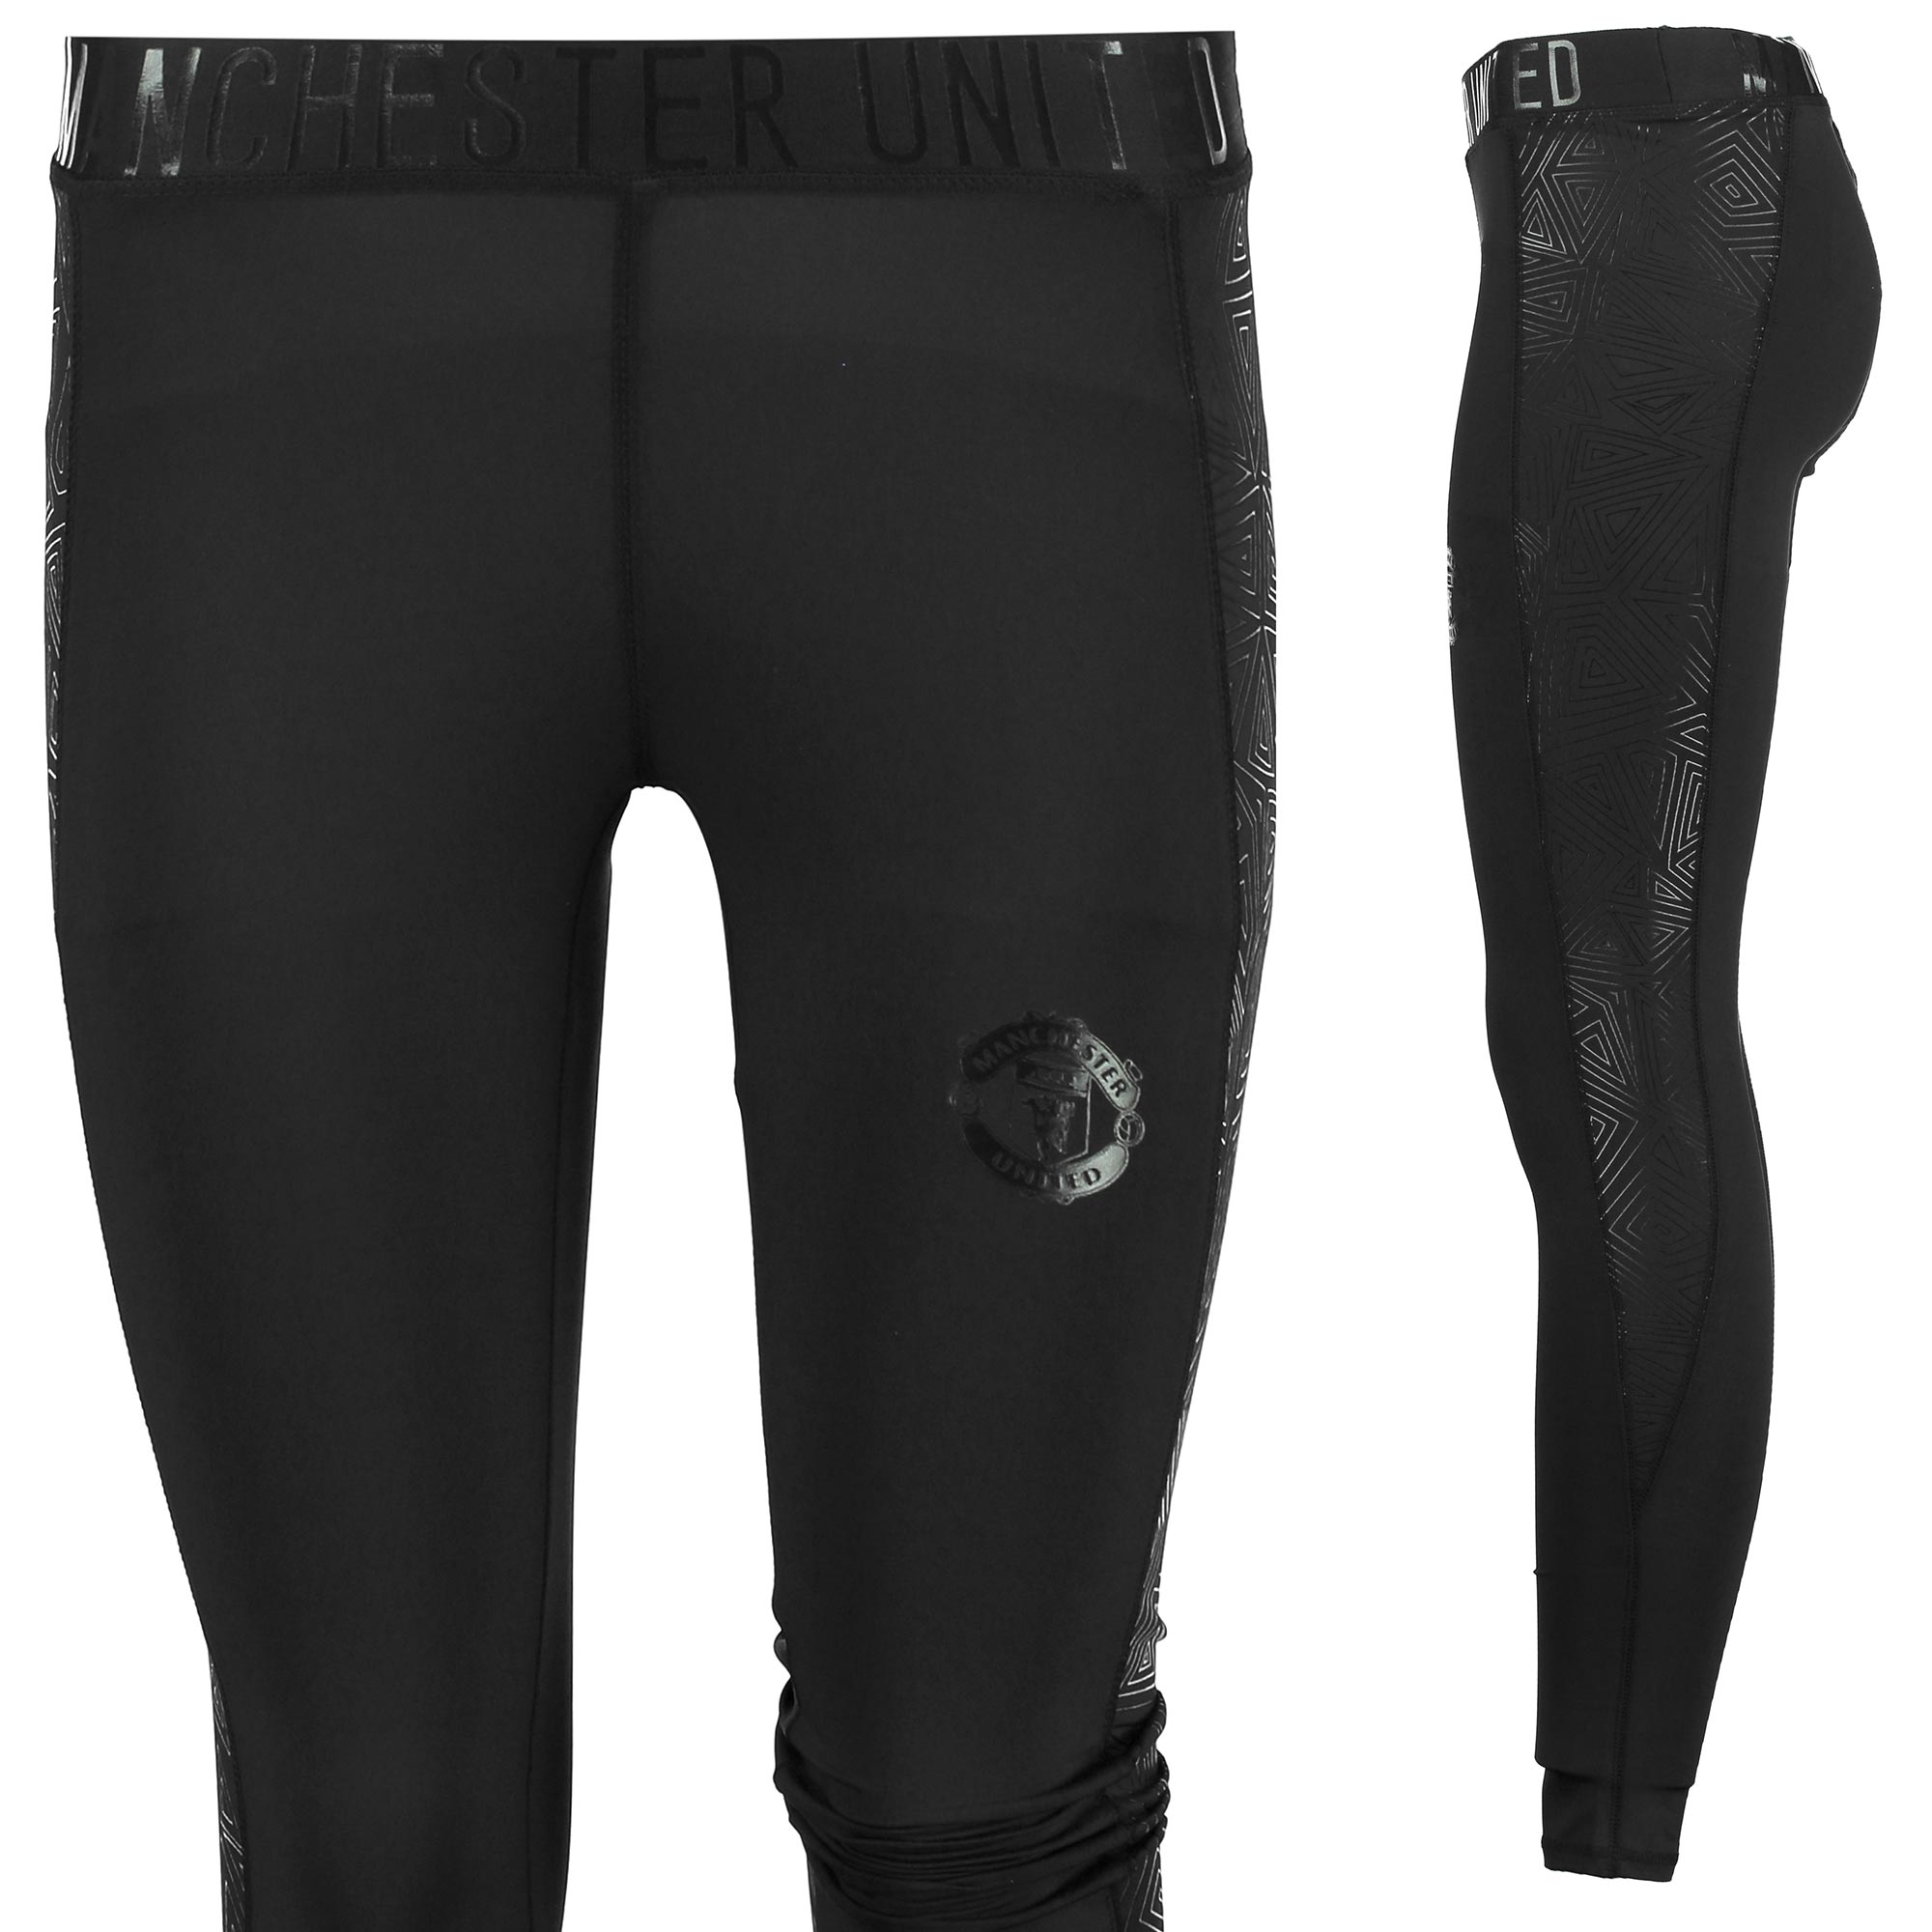 Manchester United Sportswear Leggings - Black - Womens